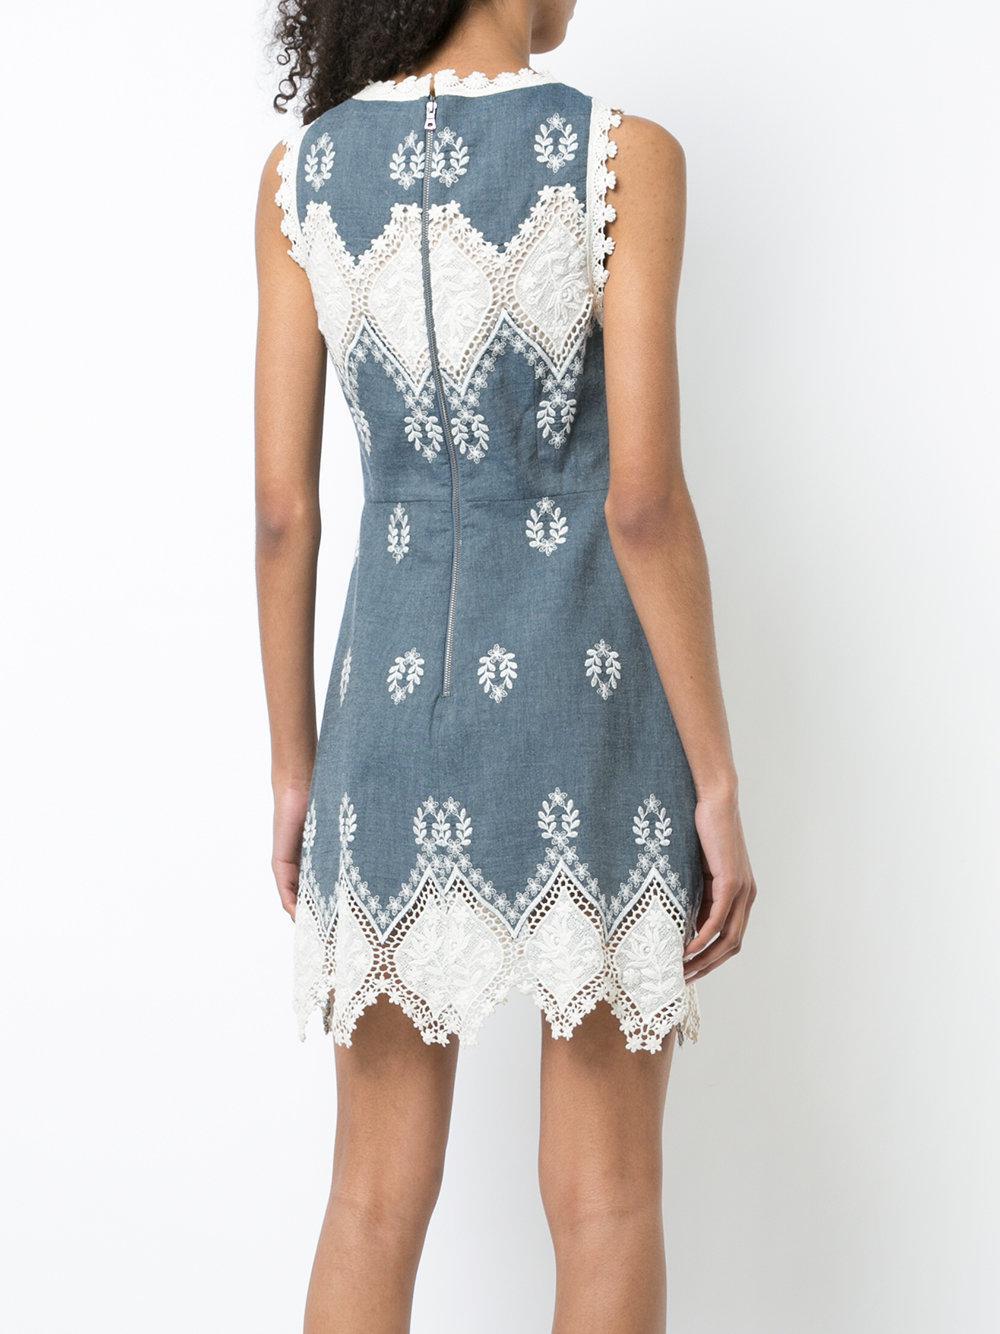 Affordable Cheap Online Discount Geniue Stockist embroidered details dress - Blue Alice & Olivia x4VGTCBI